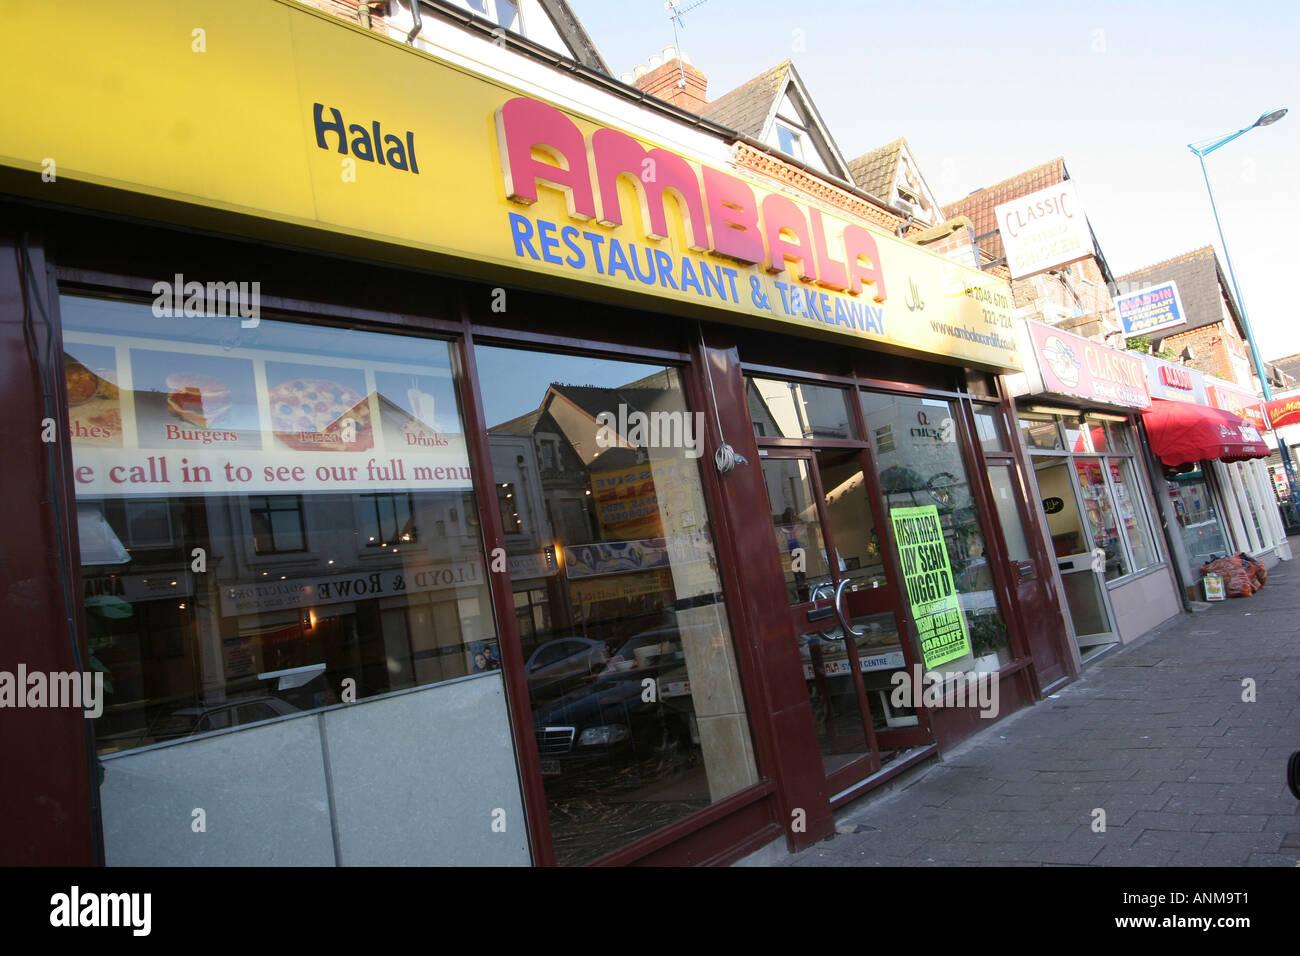 Halal Restaurant City Road Cathays Cardiff Suburbs South Wales Stock Photo Alamy